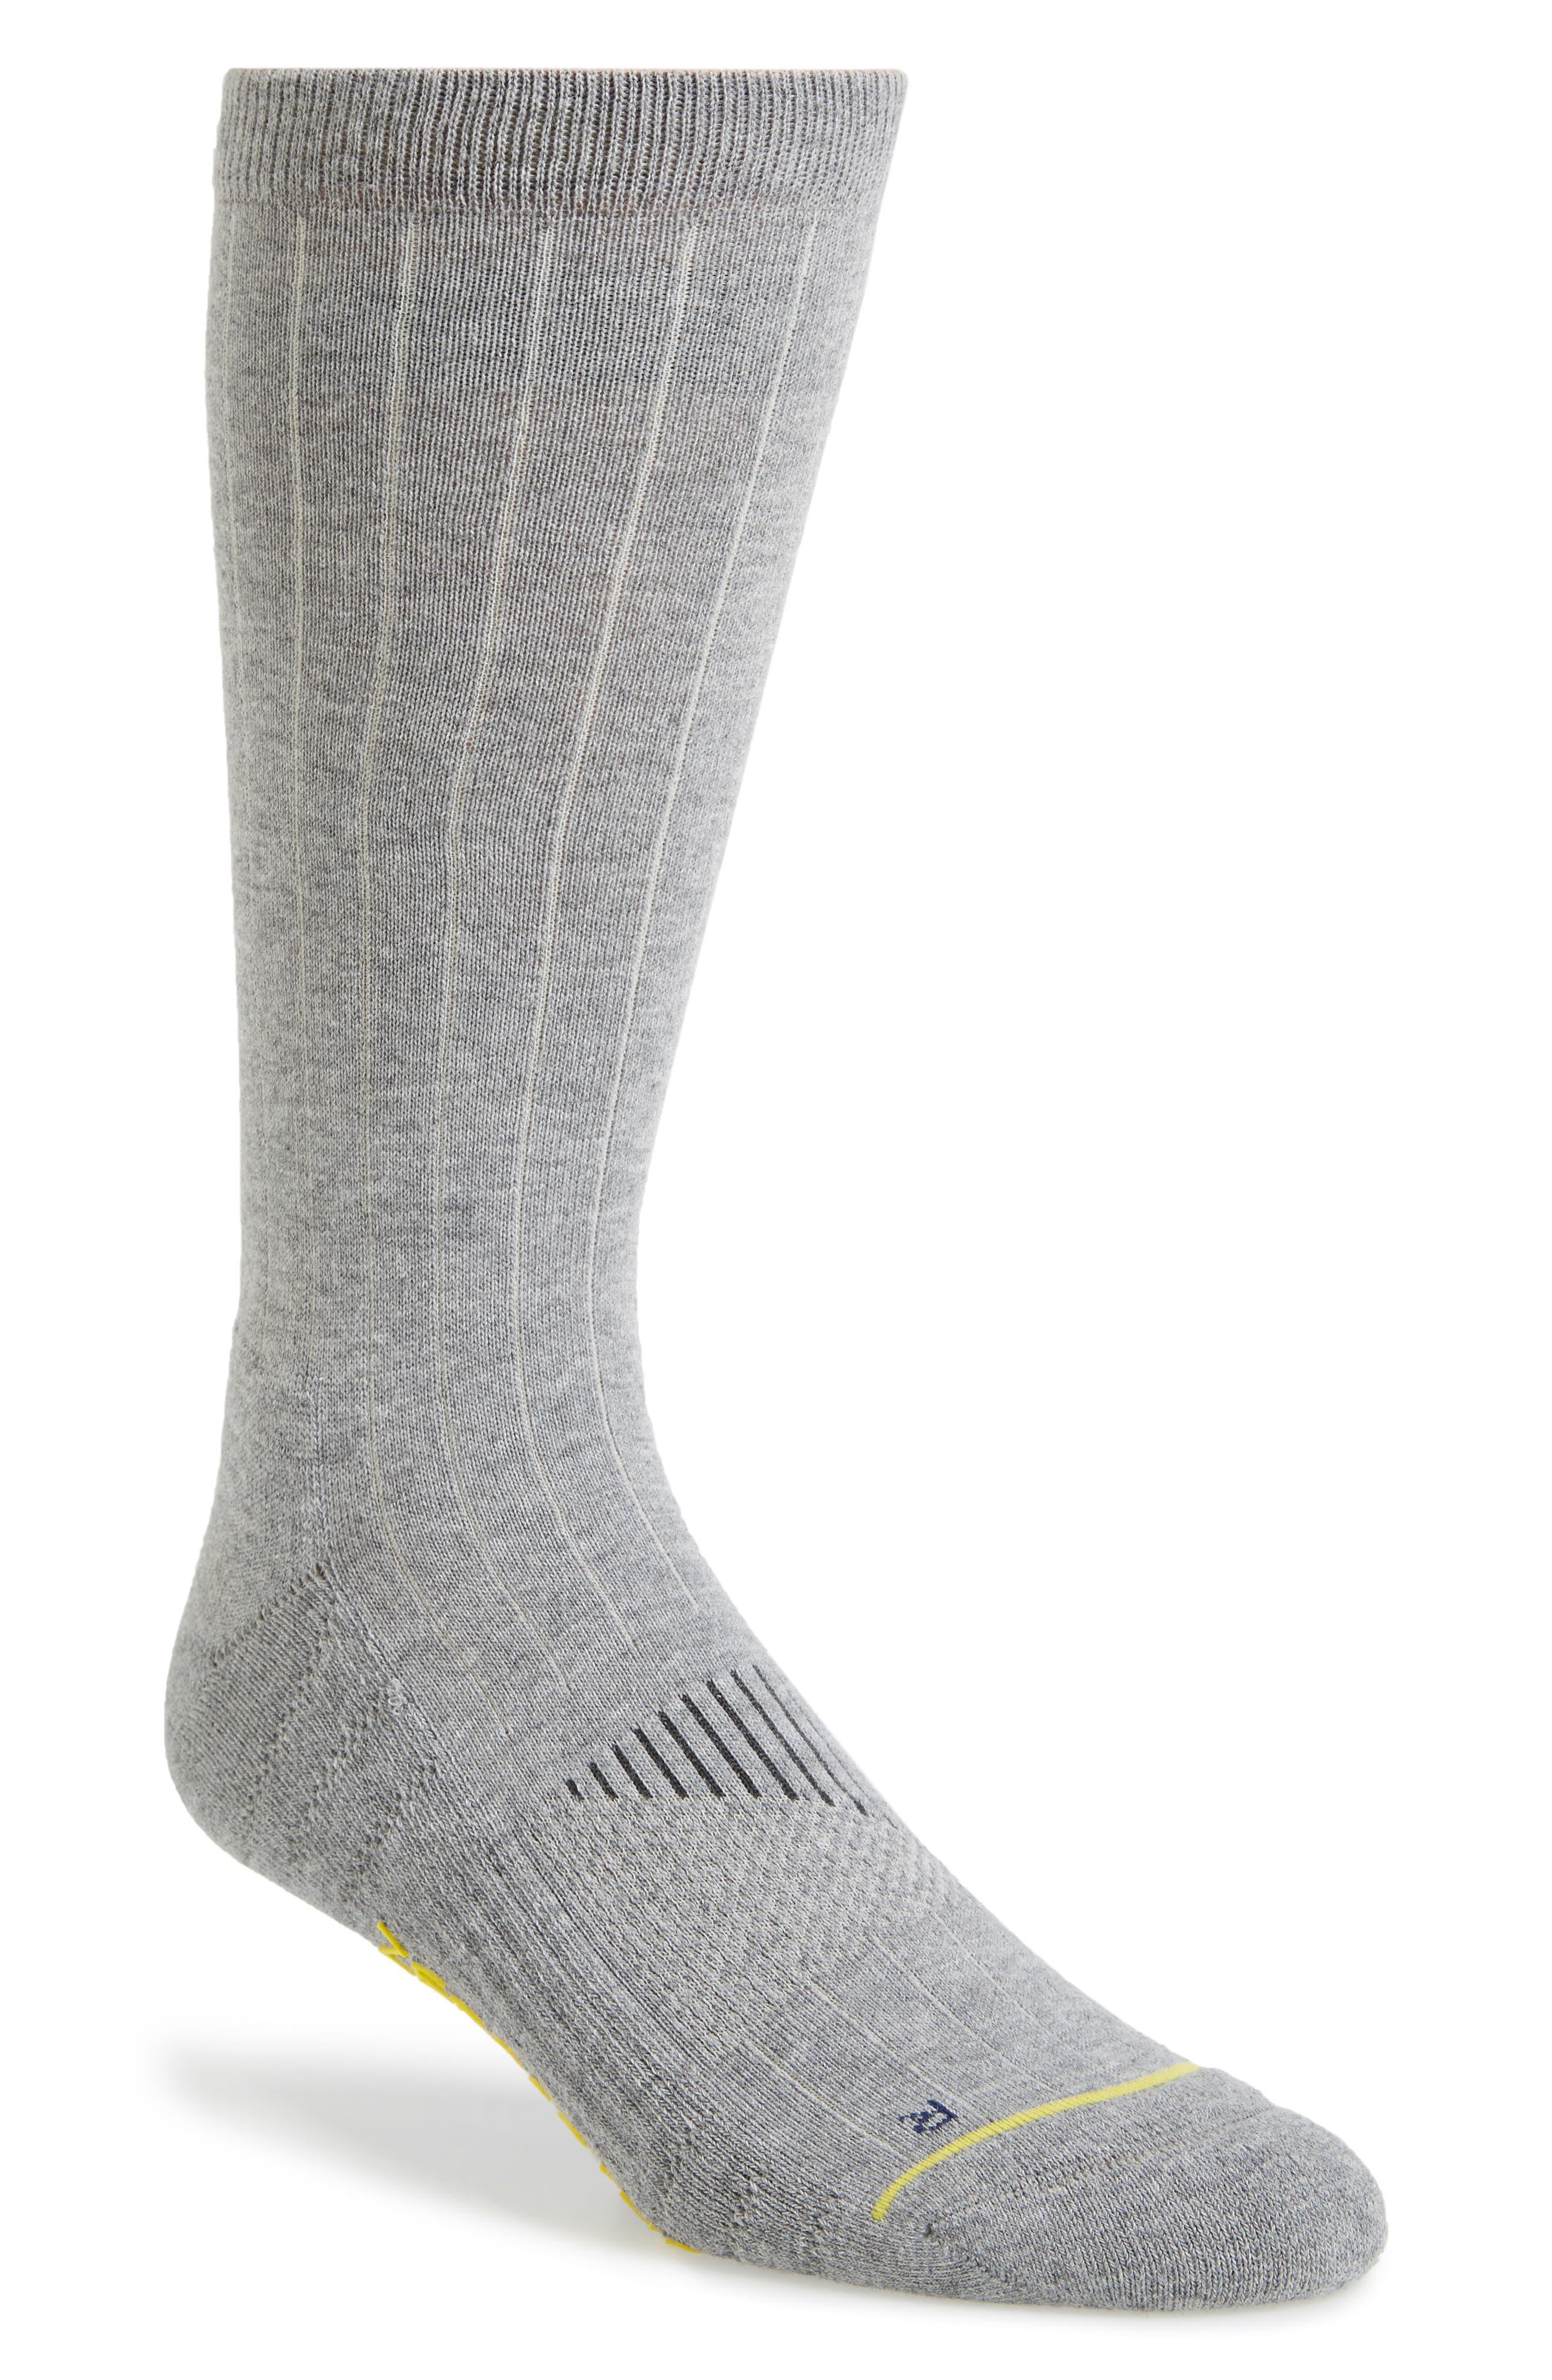 Alternate Image 1 Selected - Cole Haan ZeroGrand Ribbed Crew Socks